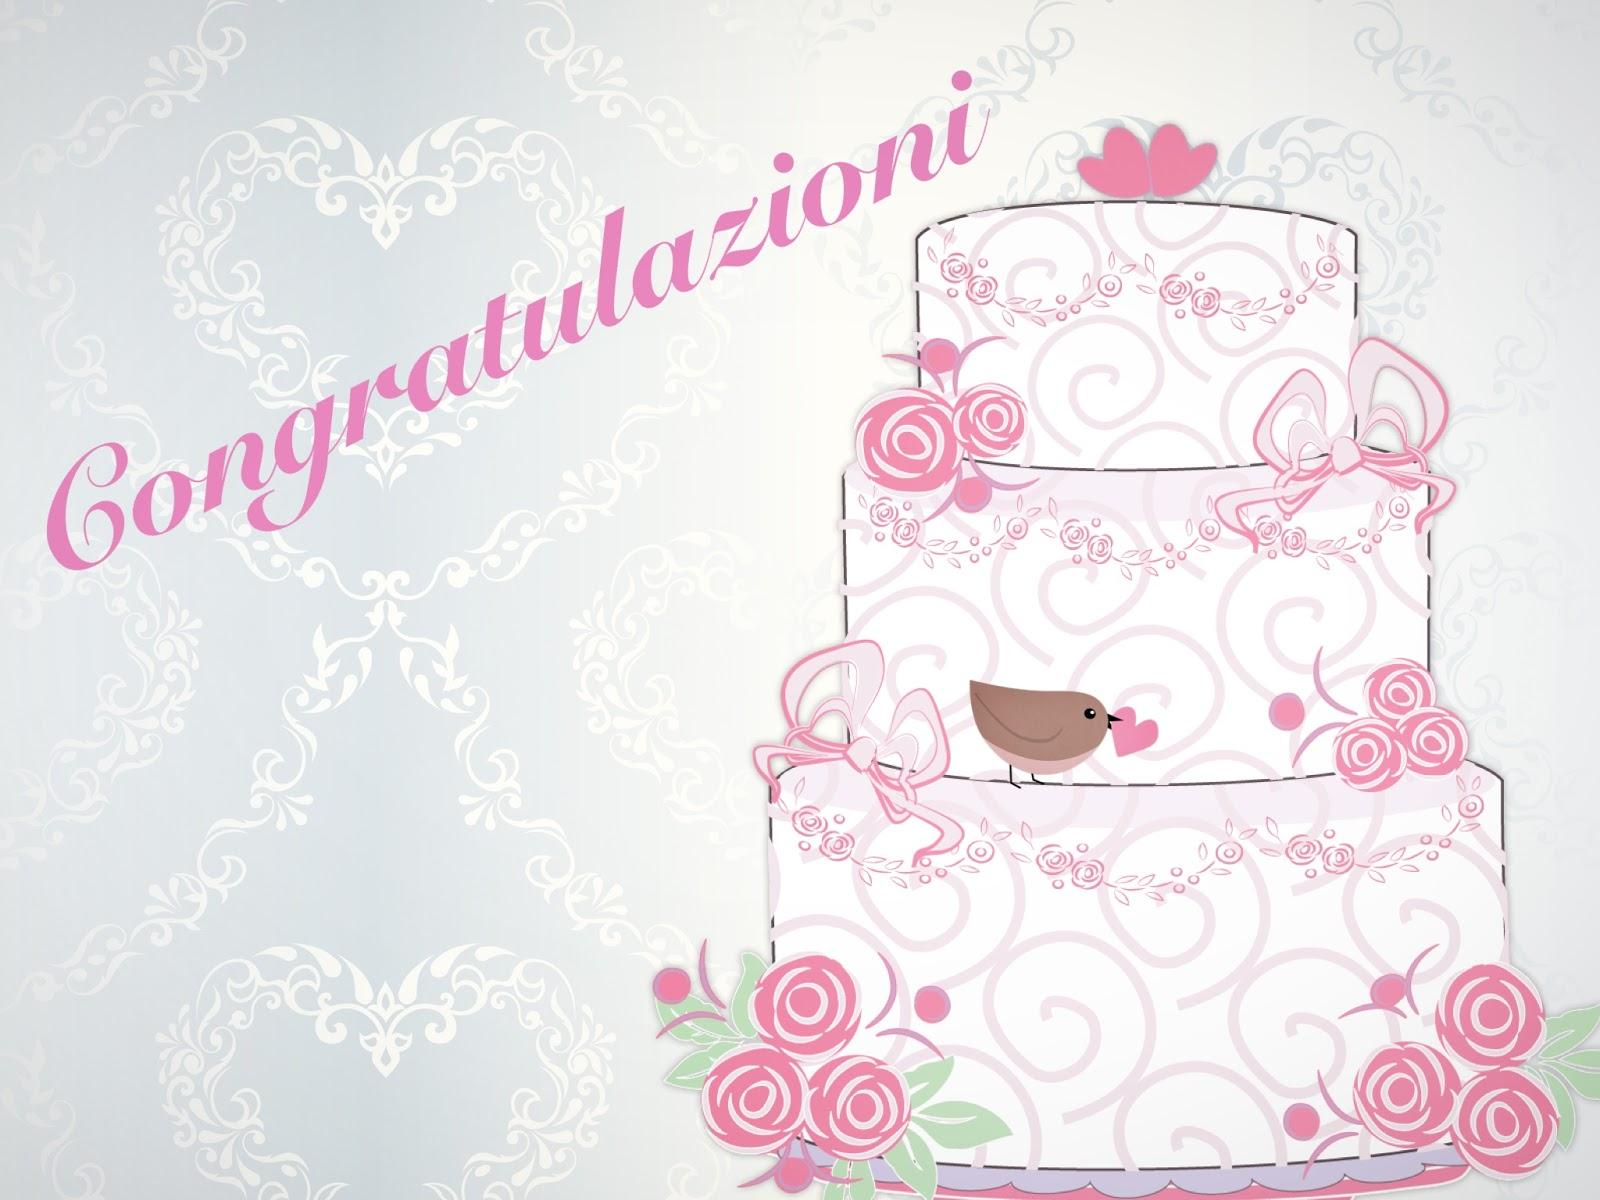 Auguri Matrimonio Yahoo : Creazioni handmade by francy sydney biglietti d auguri